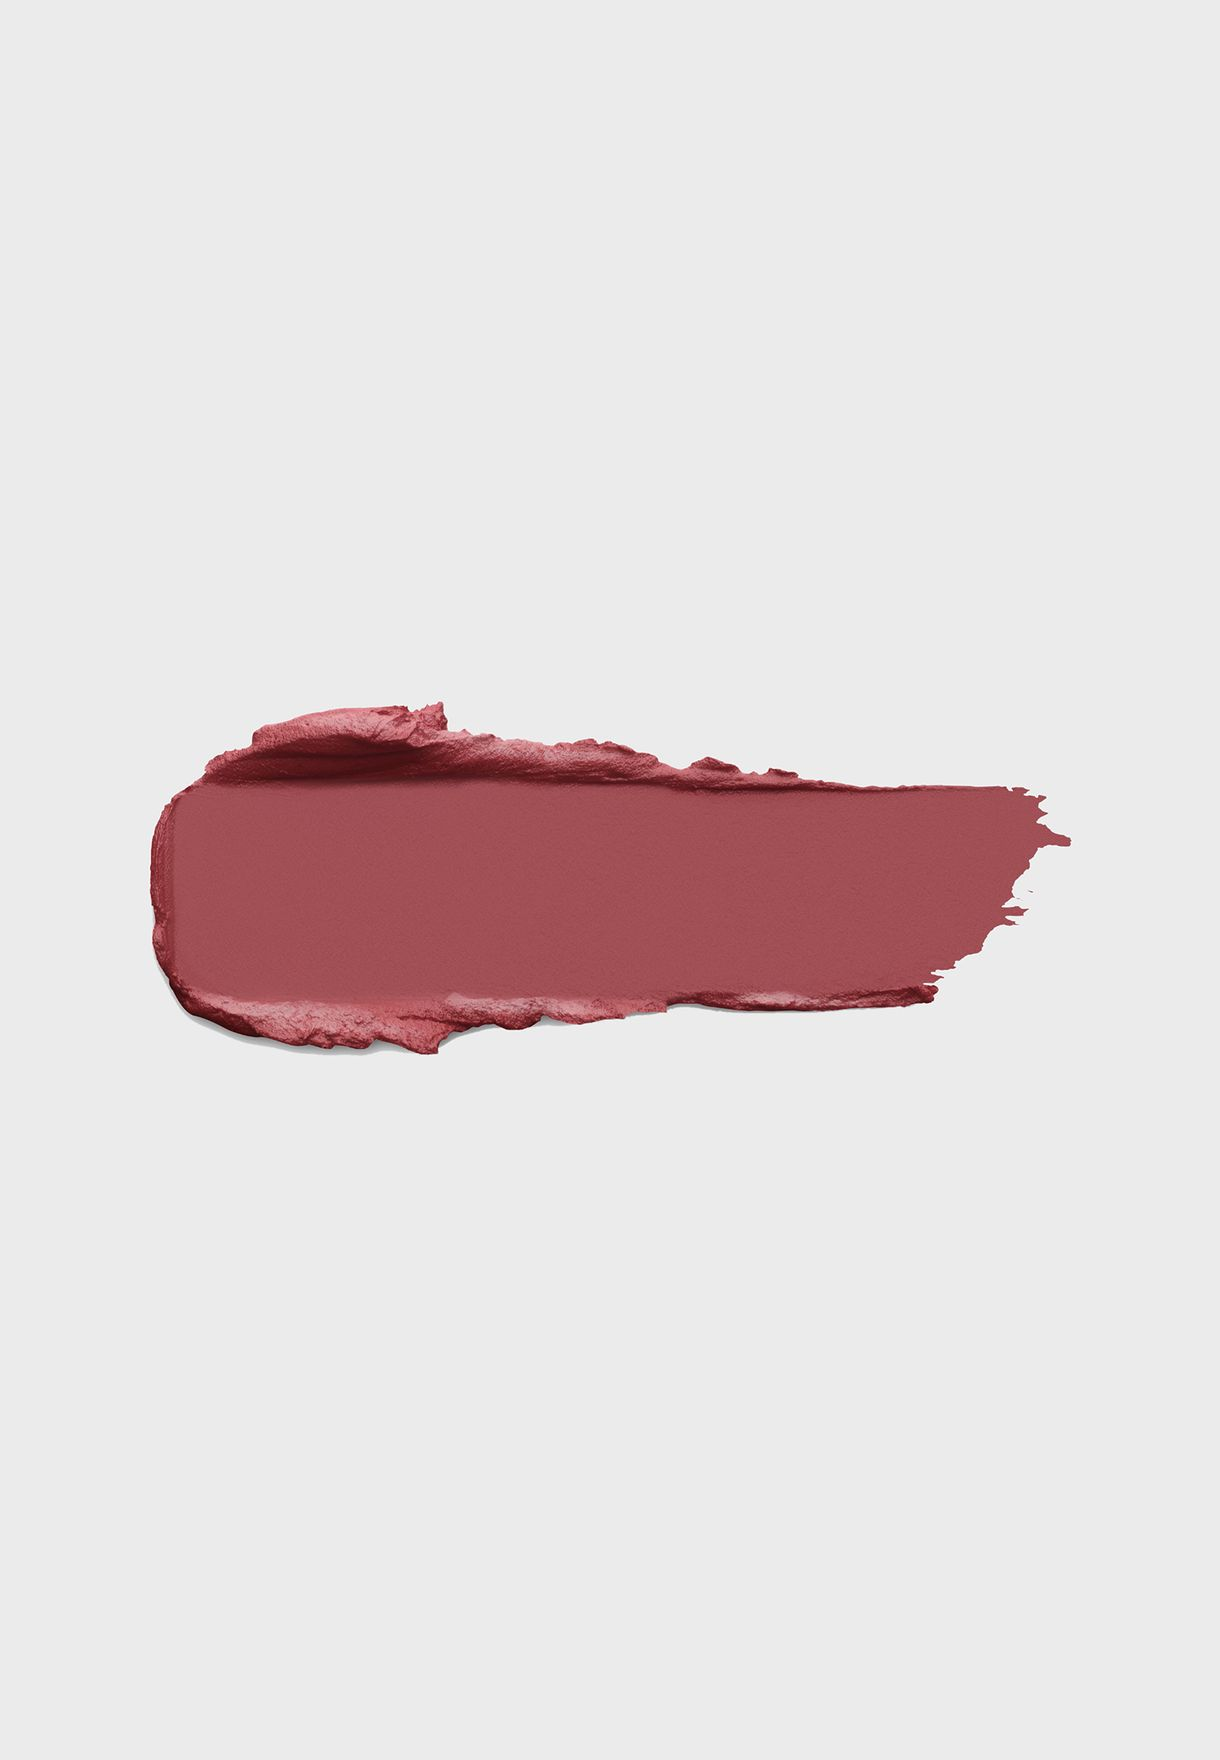 أحمر شفاه- بوسيتف اتيتيود